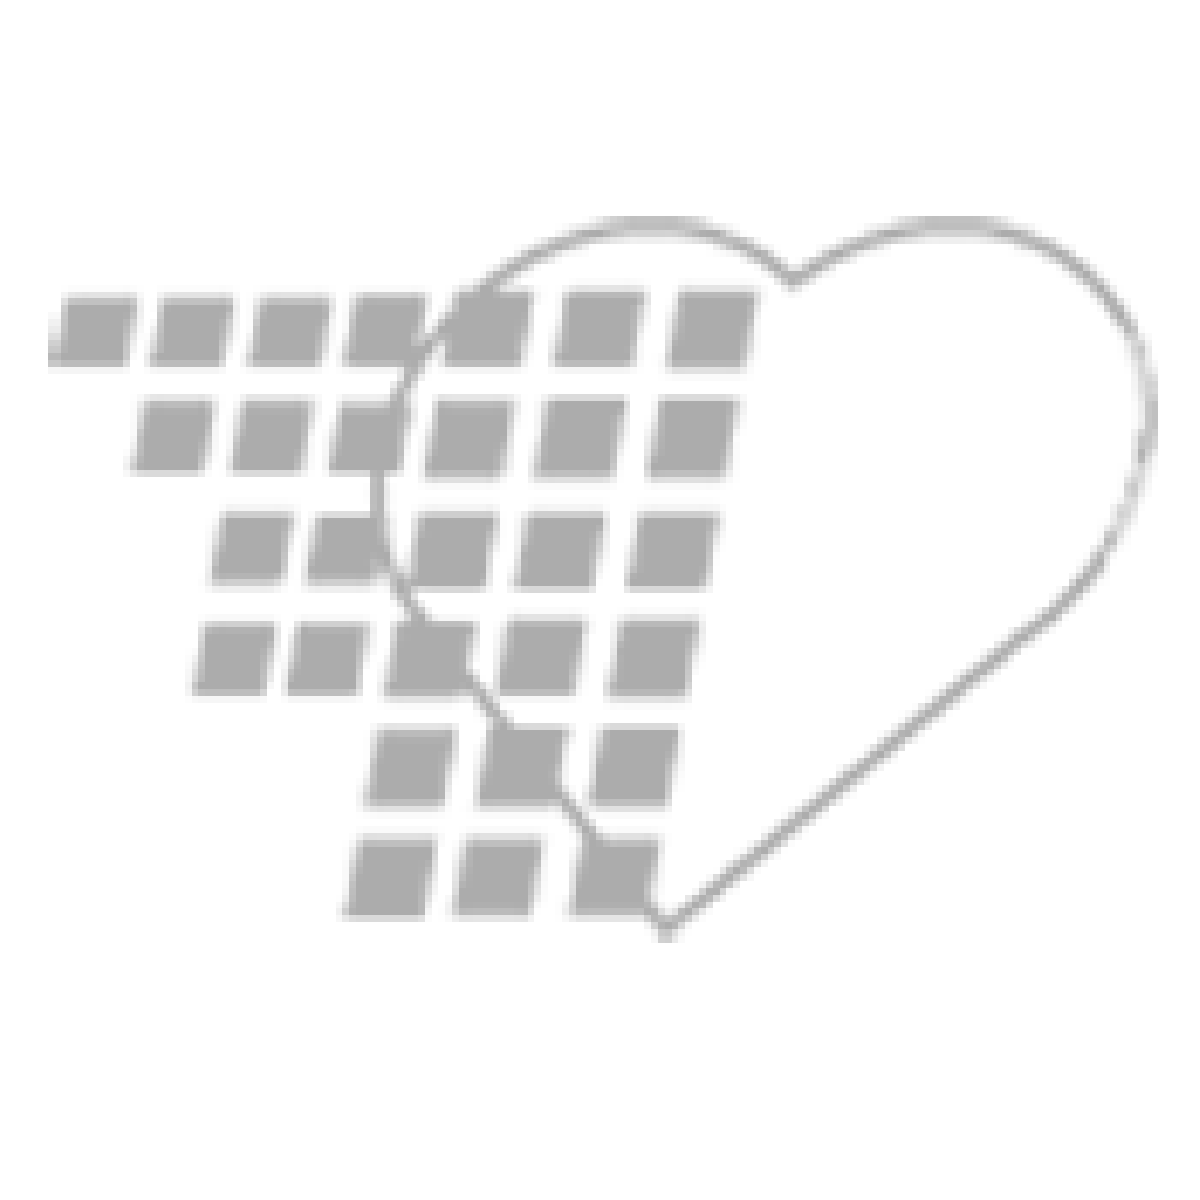 06-93-8002 - Demo Dose® Fluorauracl (Adrucl) 10 mL 500 mg/10 mL